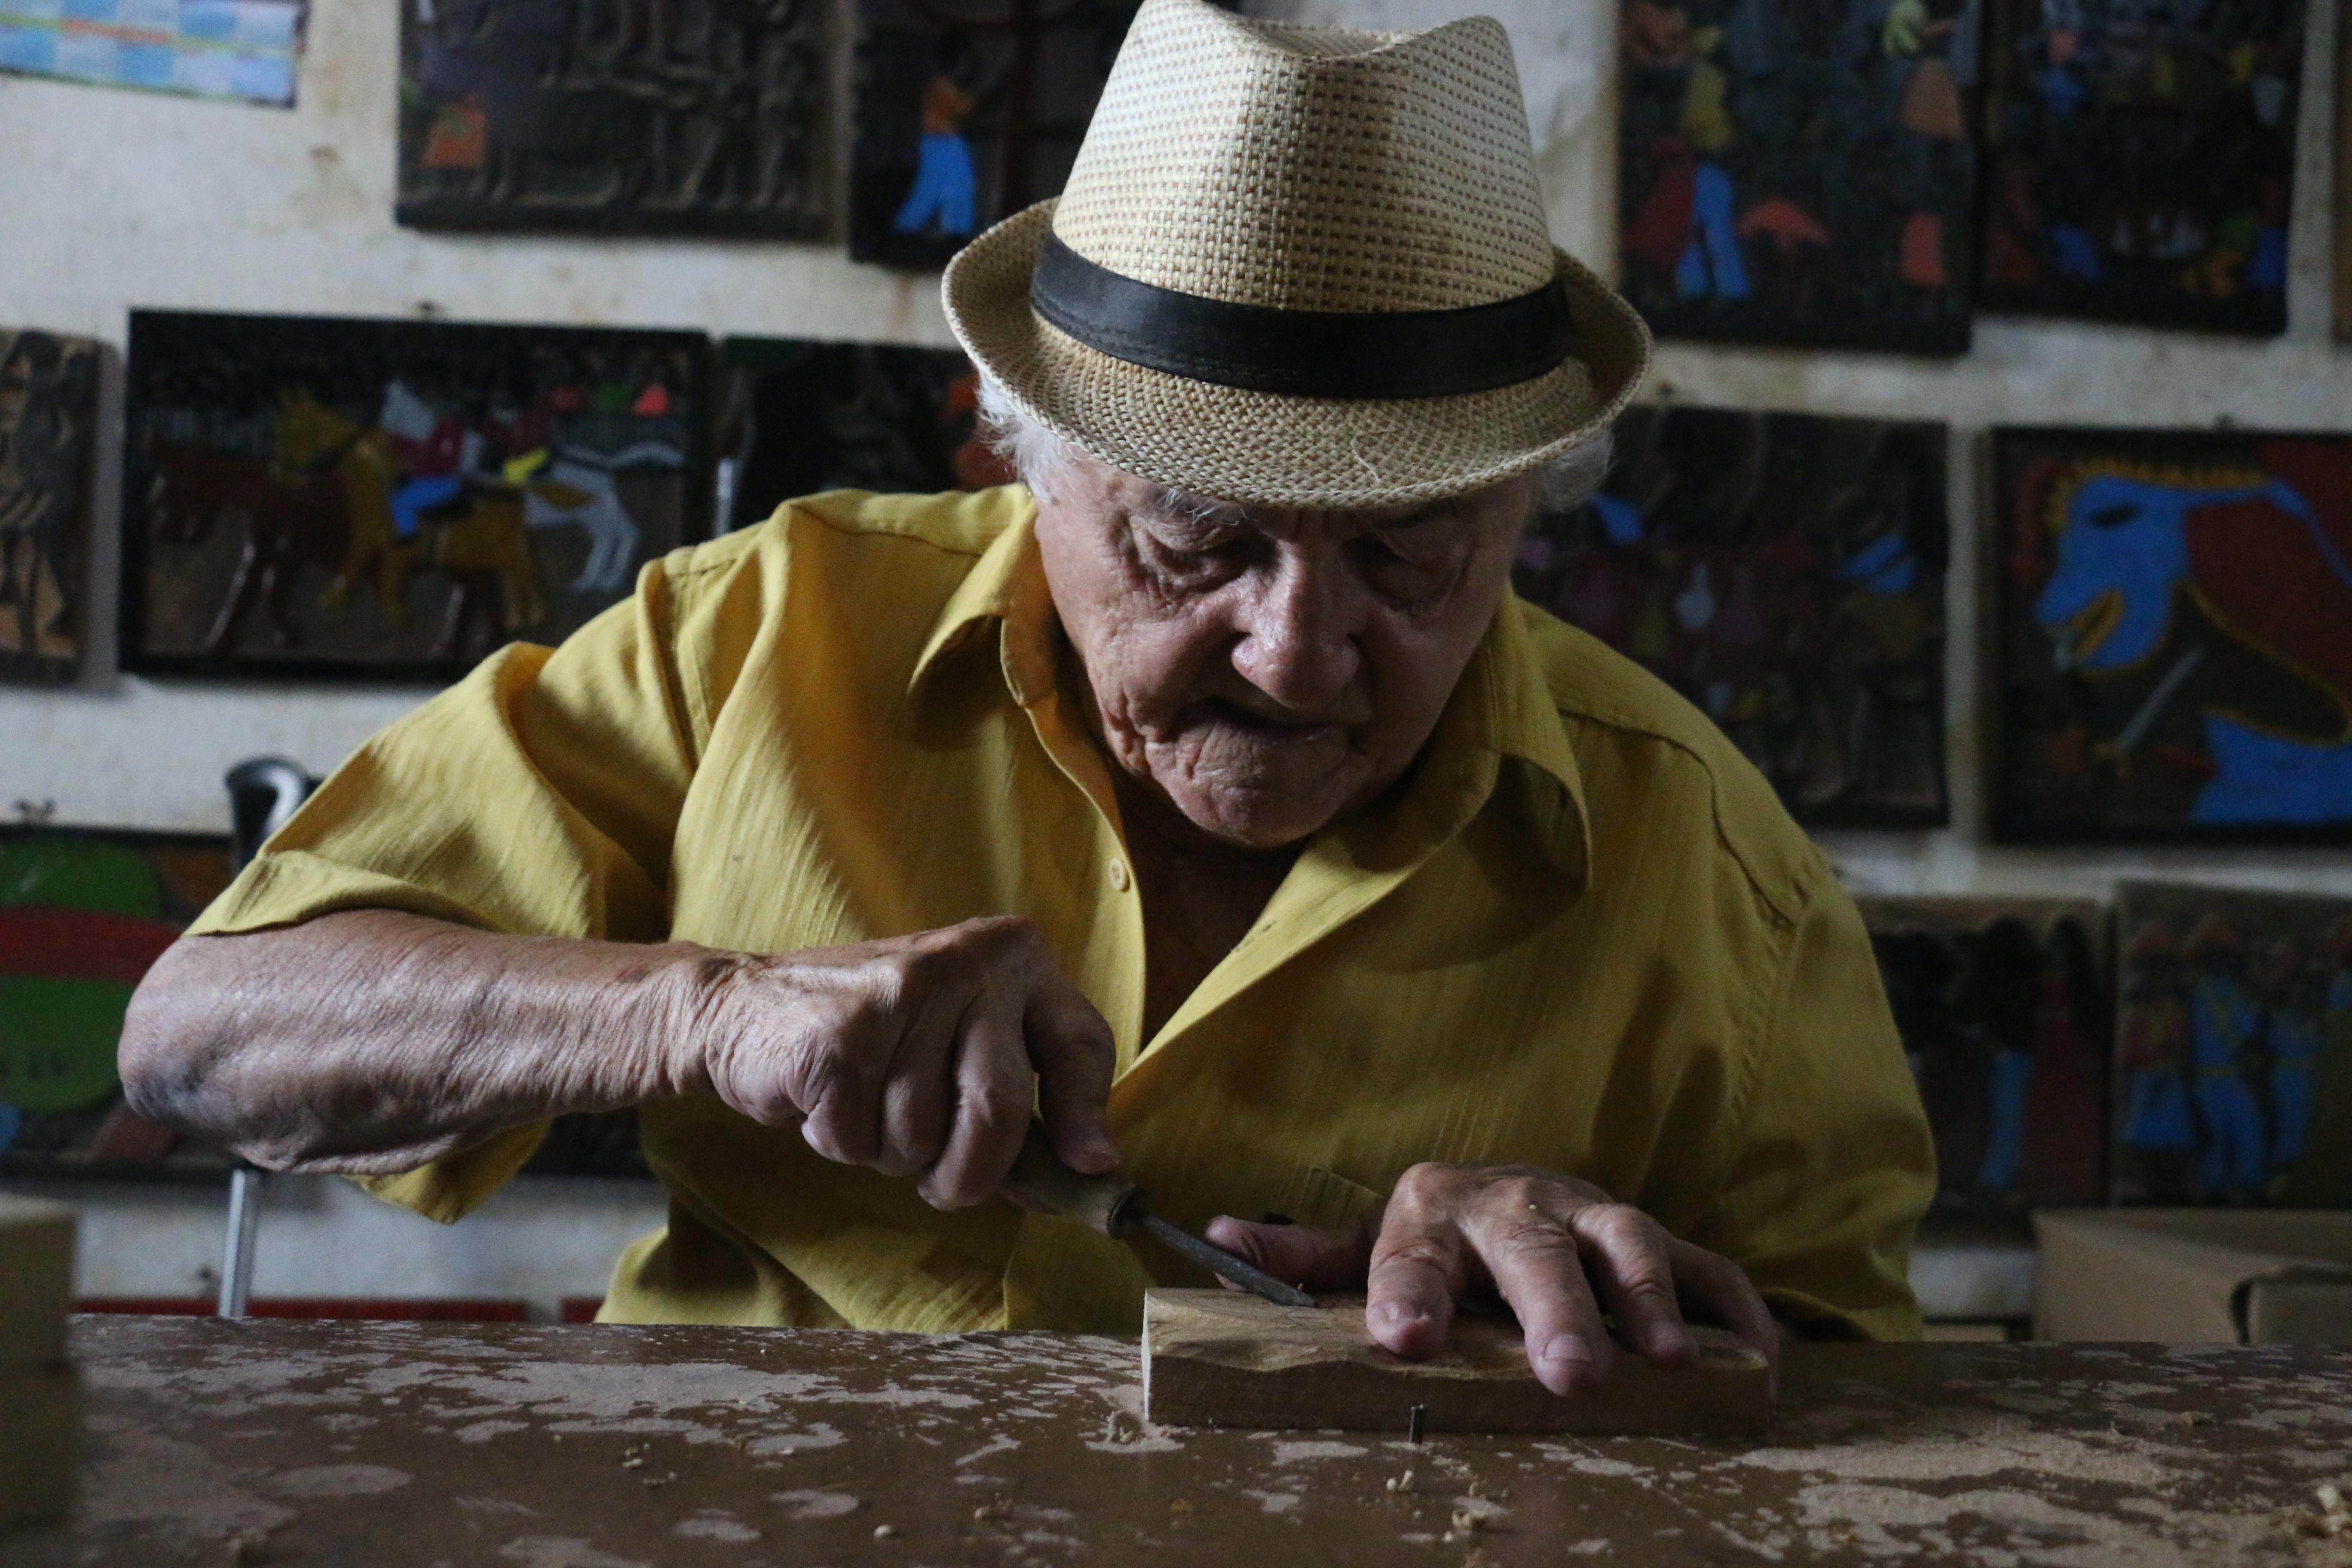 O xilogravurista J.Borges é Patrimônio Vivo de Pernambuco. Crédito: Gabriel Melo Esp DP